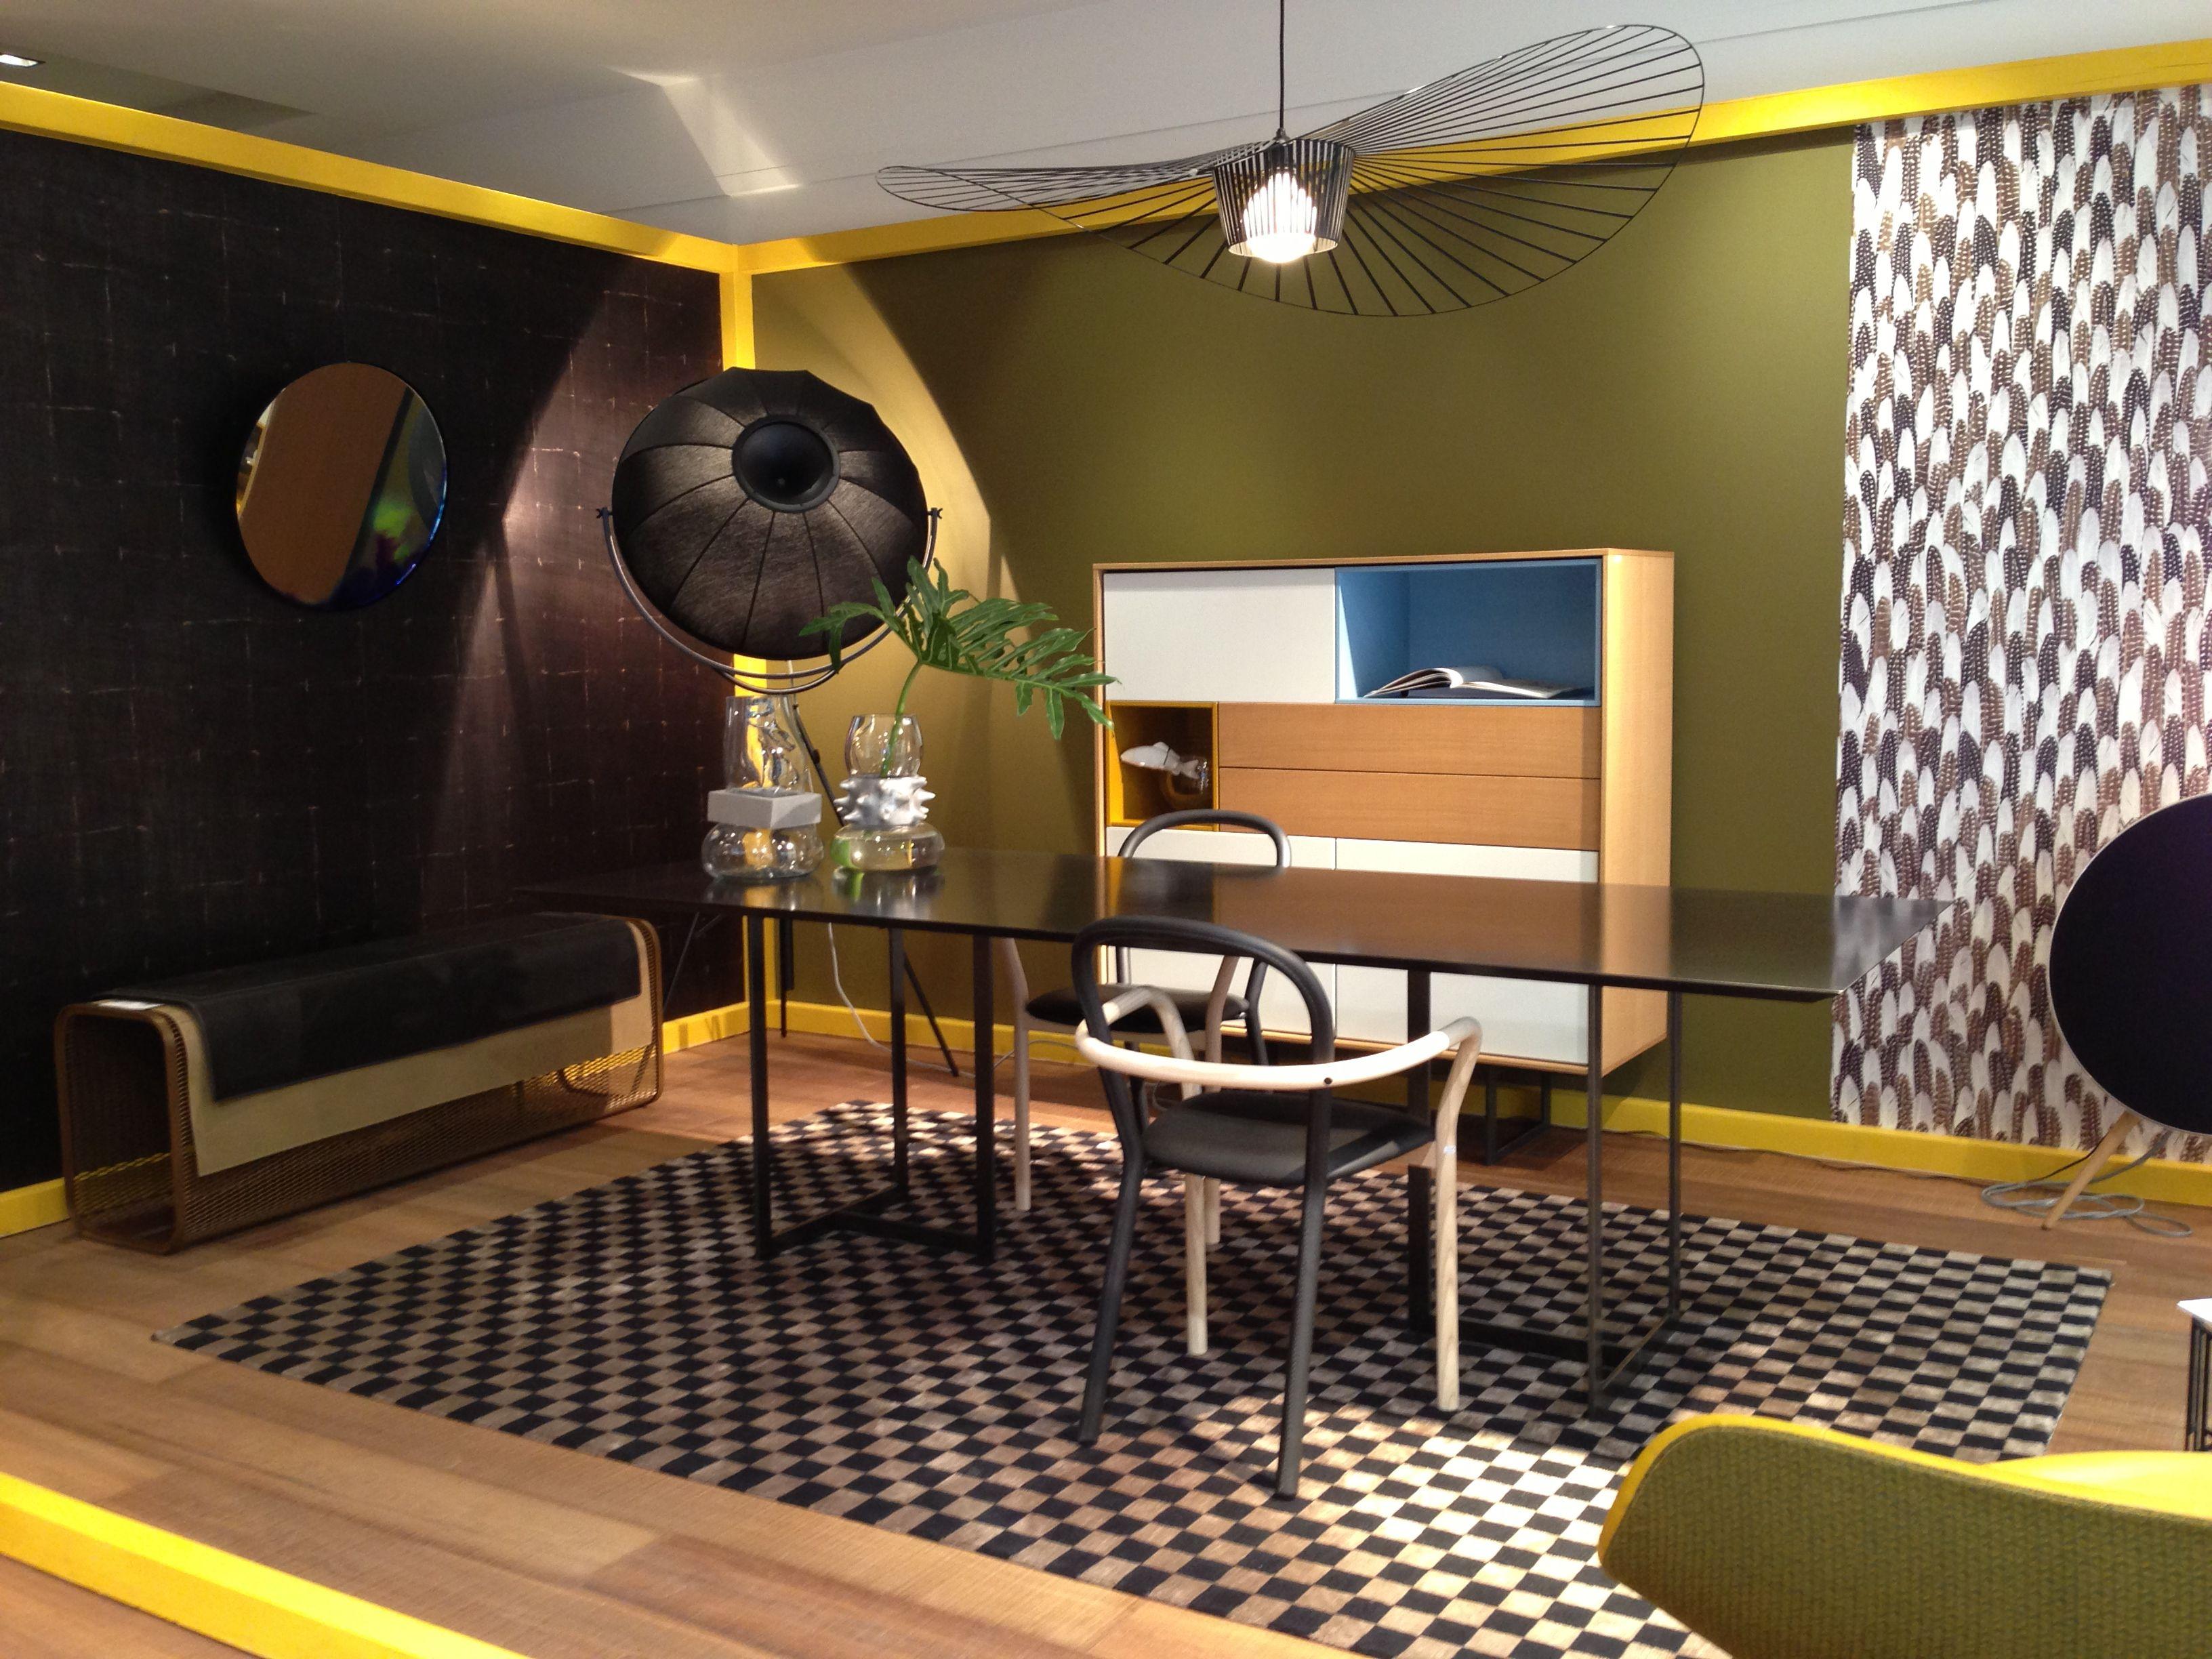 Ambiance Claude Cartier Dcoration - 25 Rue Auguste Comte 69002 mobilier  contemporain Lyon - MOROSO -